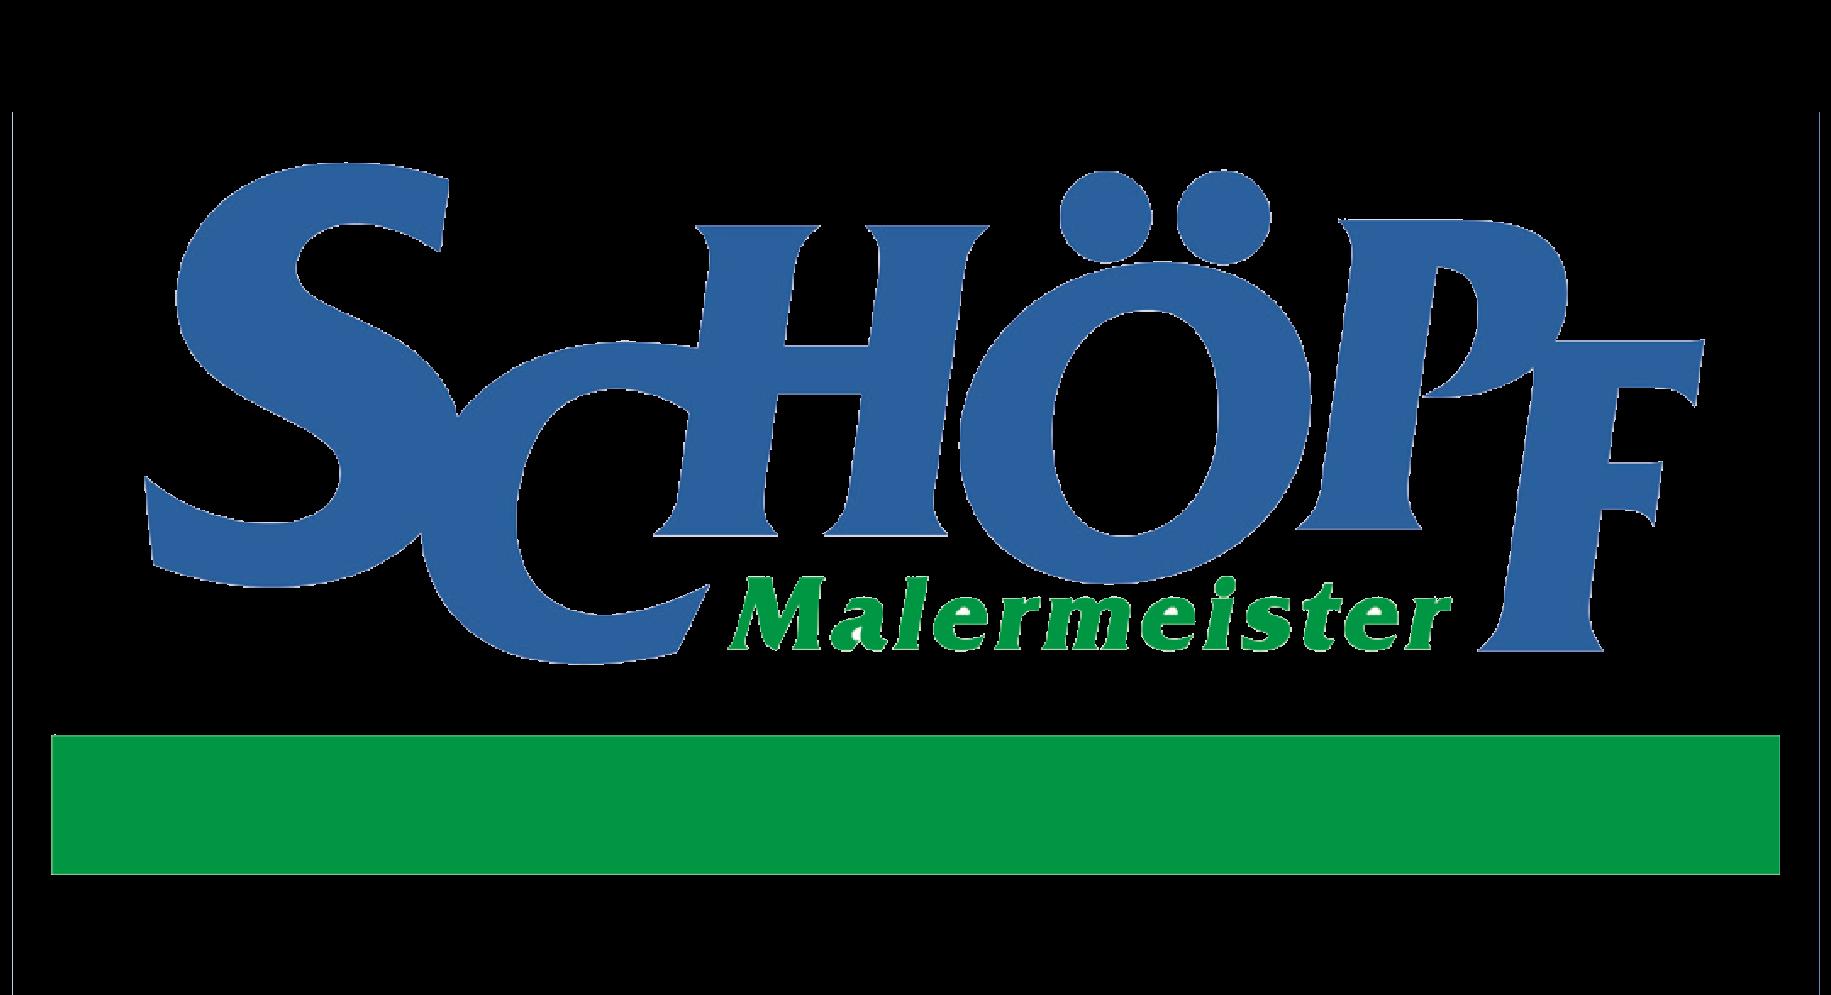 Malerbetrieb Gerold Schöpf logo